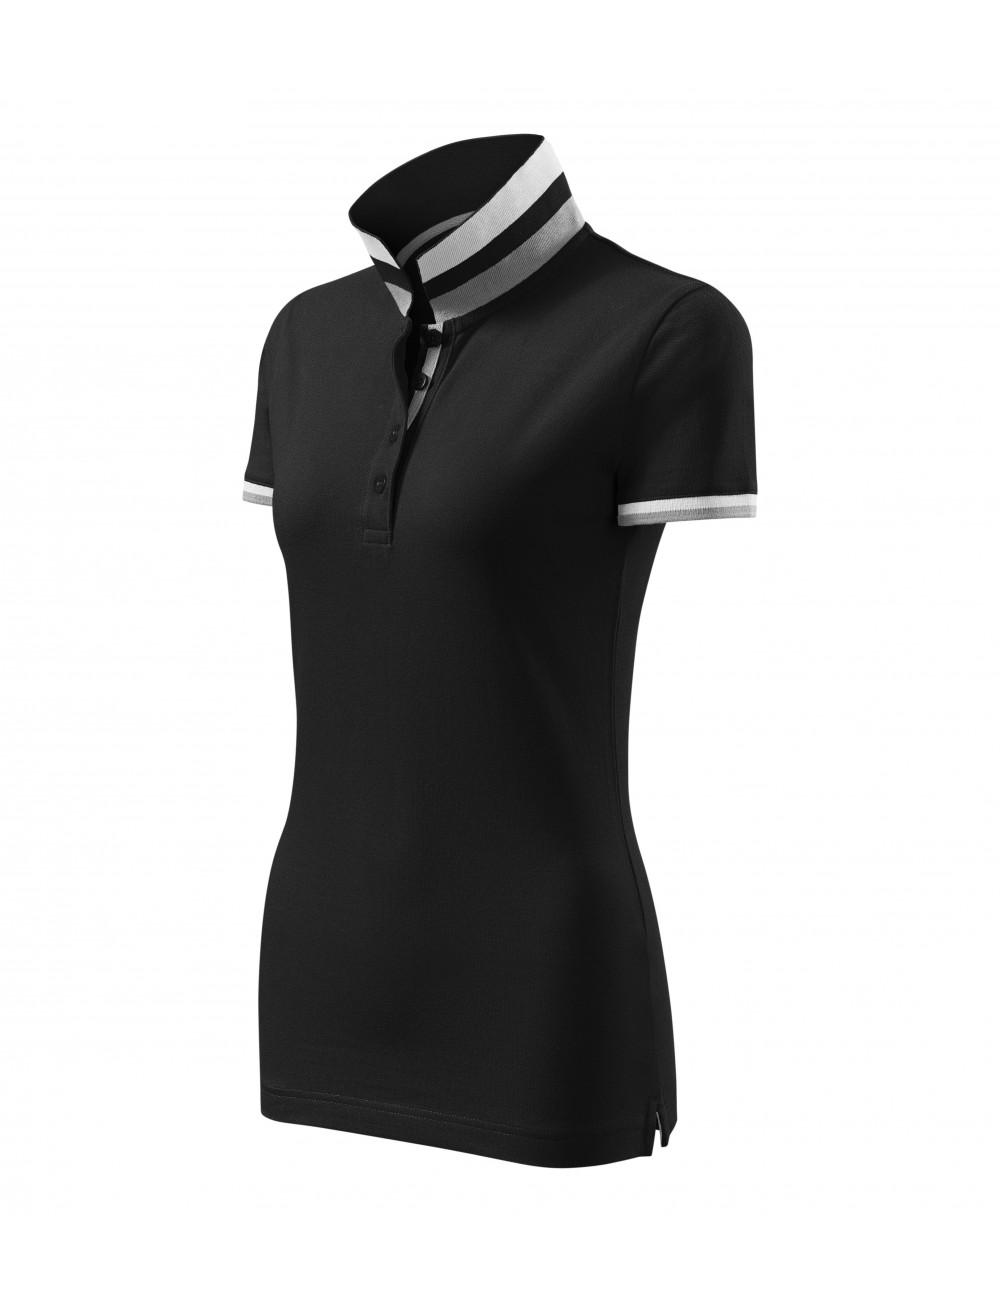 Adler MALFINIPREMIUM Koszulka polo damska Collar Up 257 czarny